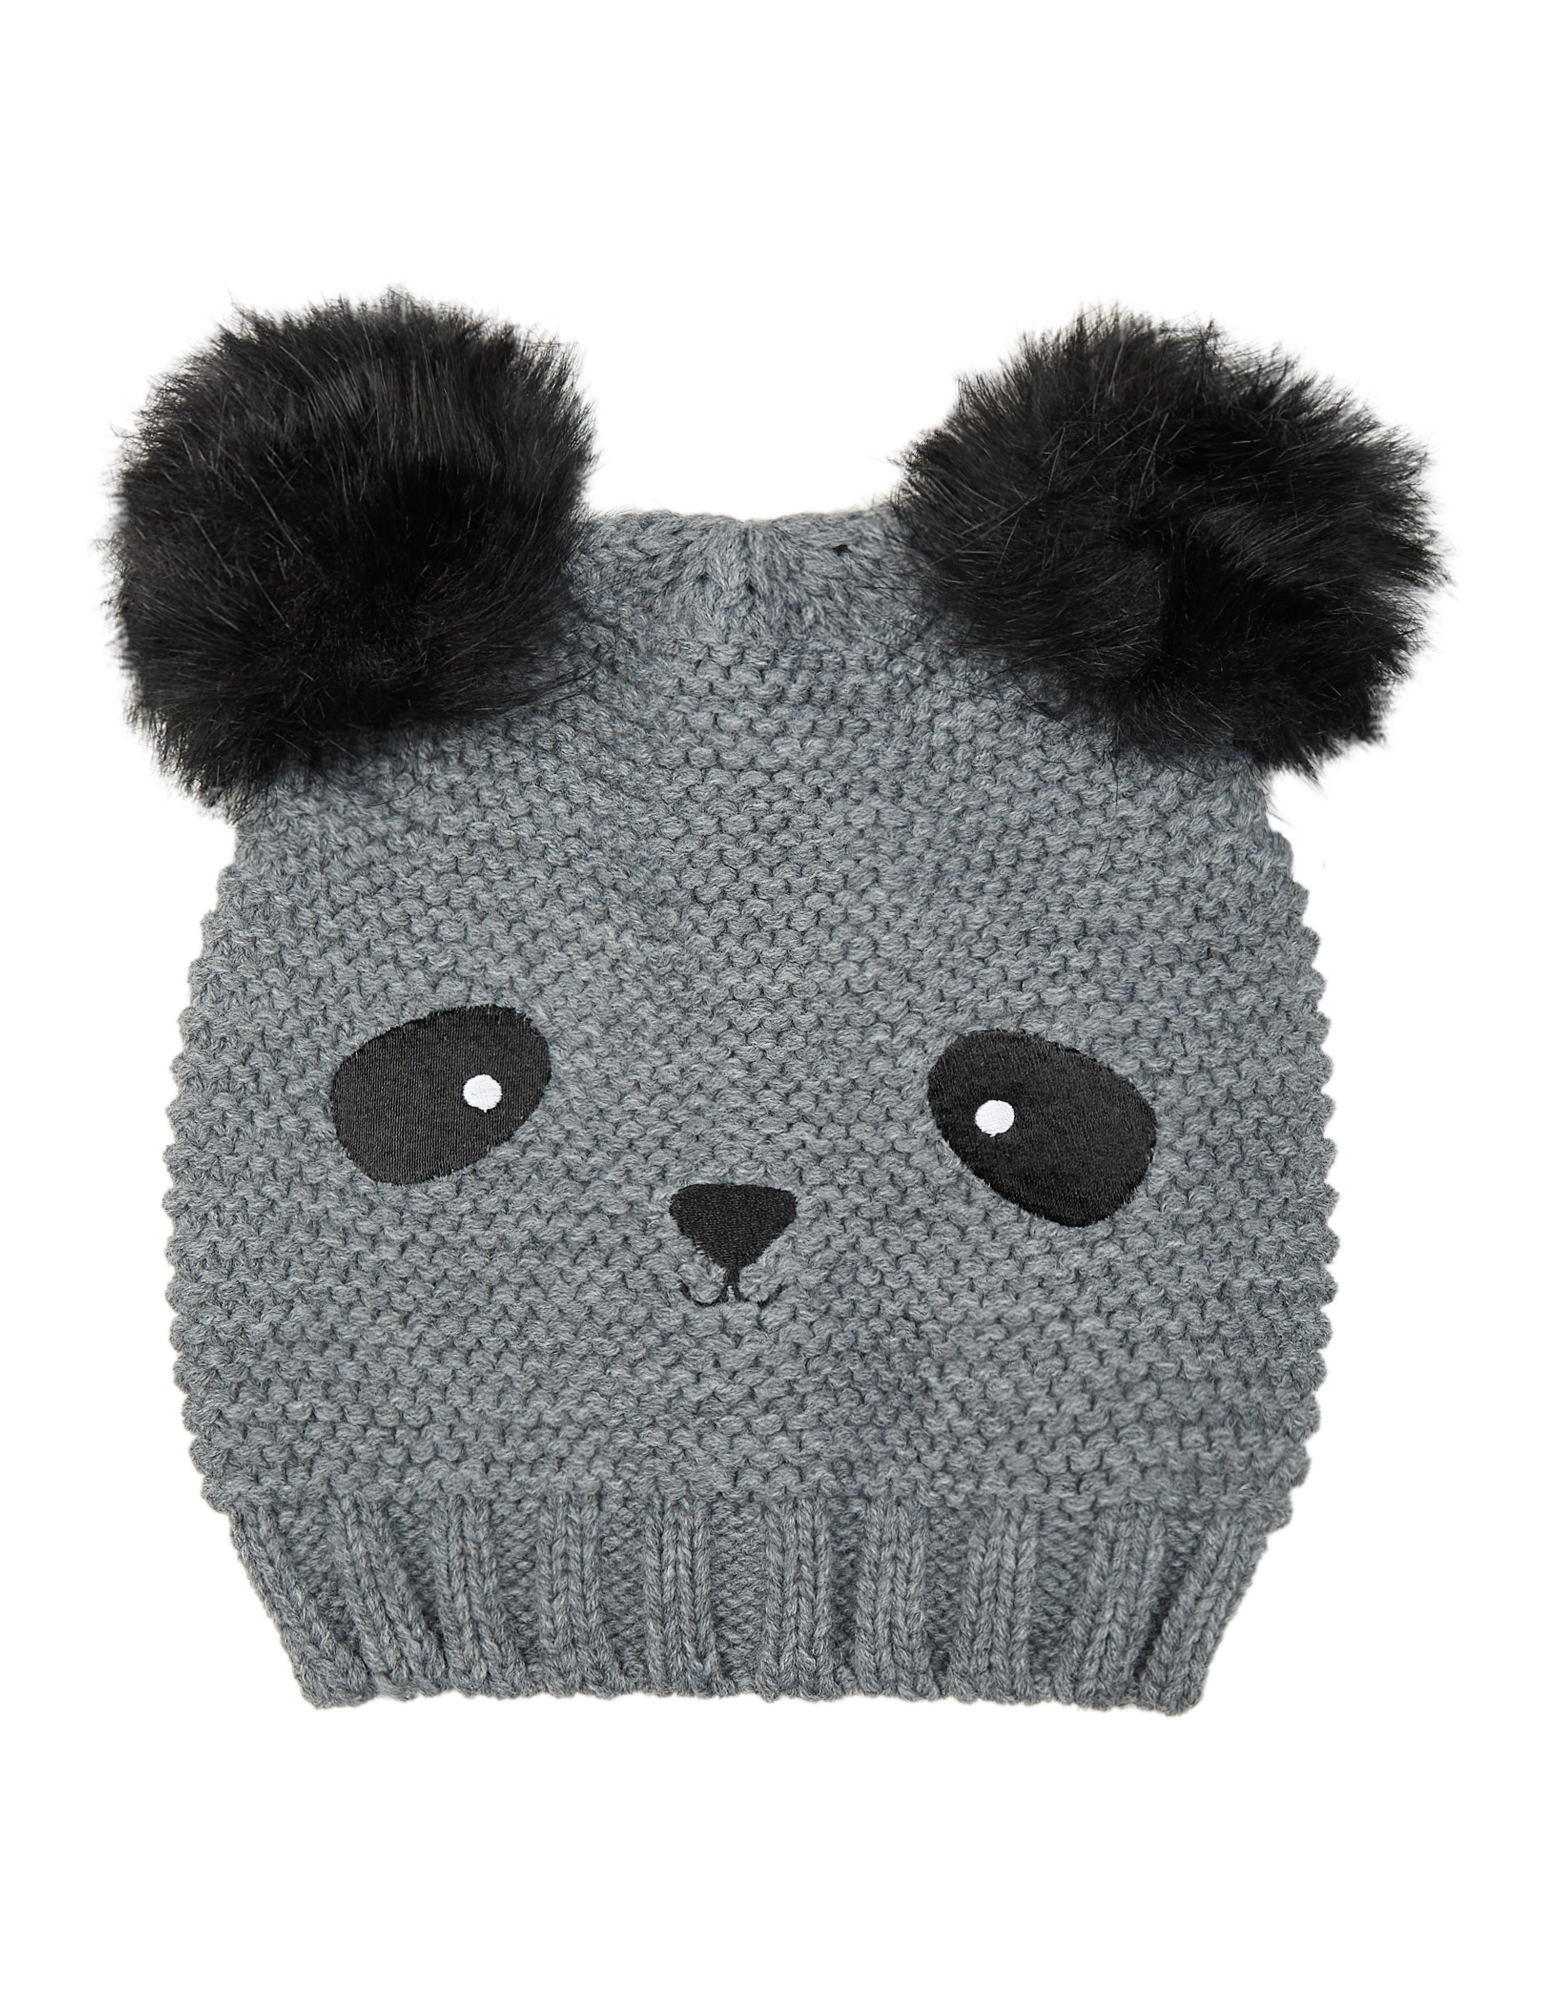 Damen Pudelmütze im Panda-Look mit Webpelz-Bommeln | Accessoires > Mützen > Bommelmützen | Takko